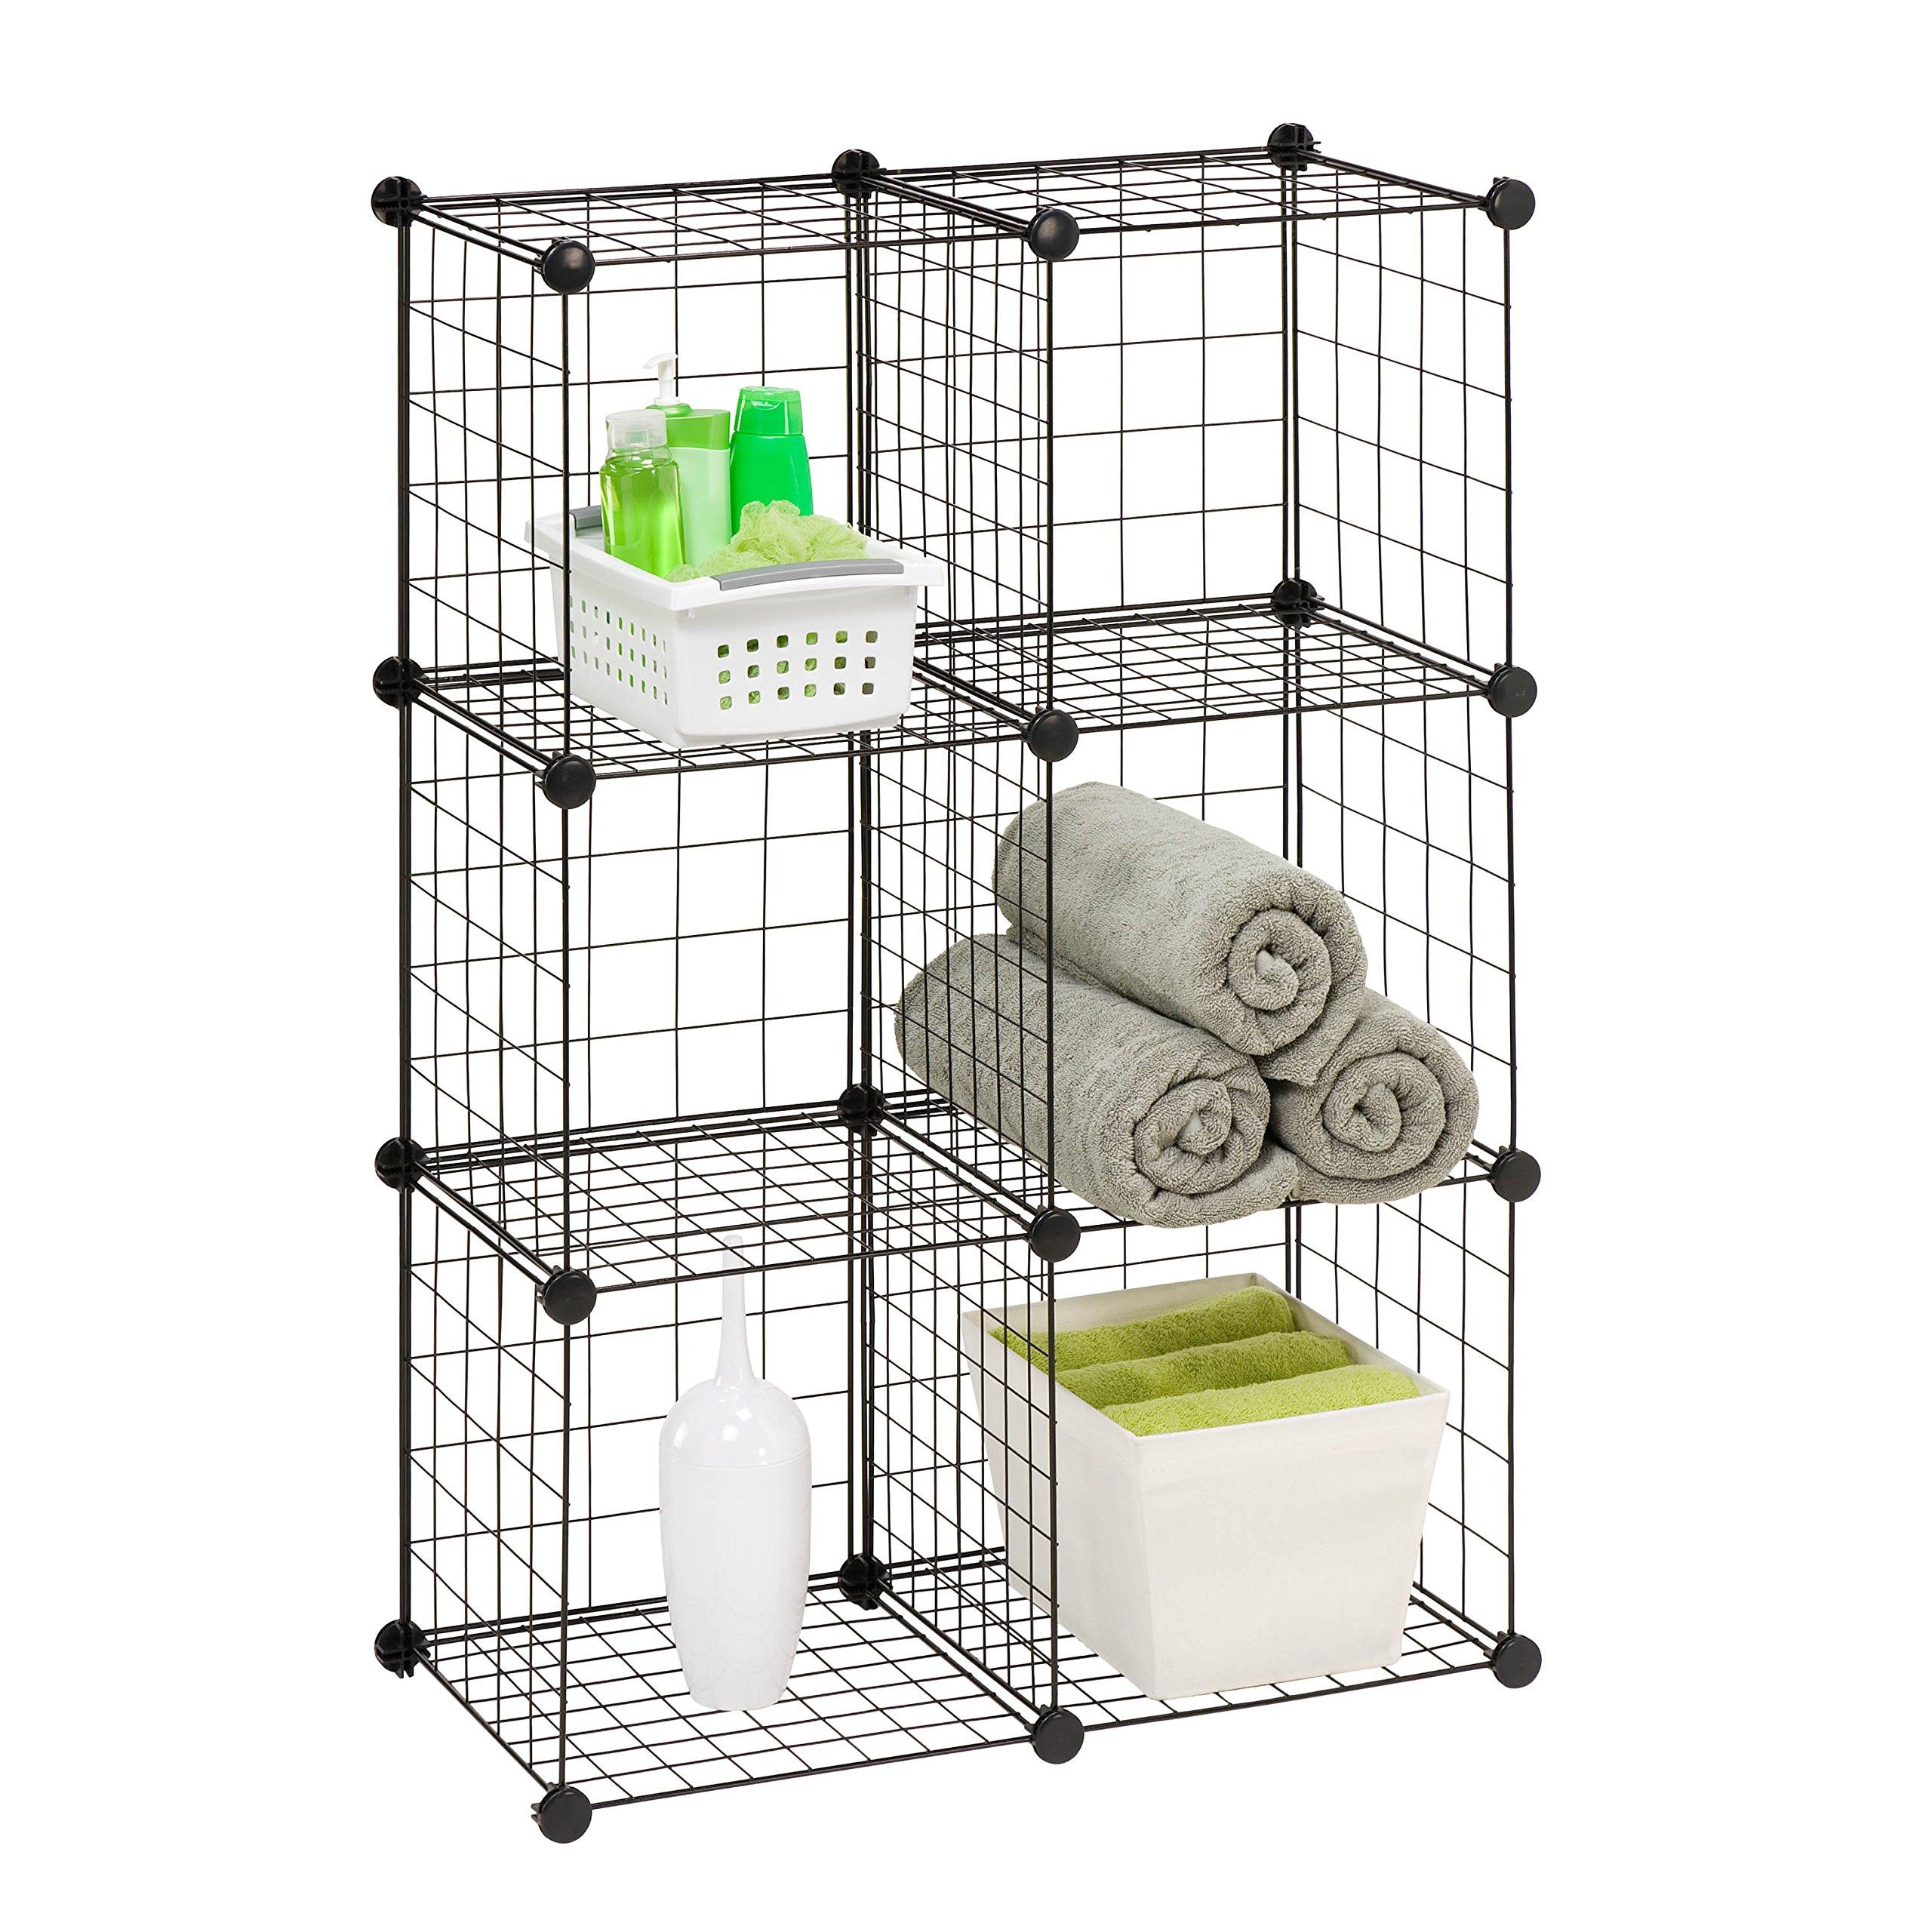 Honey-Can-Do SHF-02113 Modular Mesh Storage Cube, 6-Pack, Black, 43Hx29W